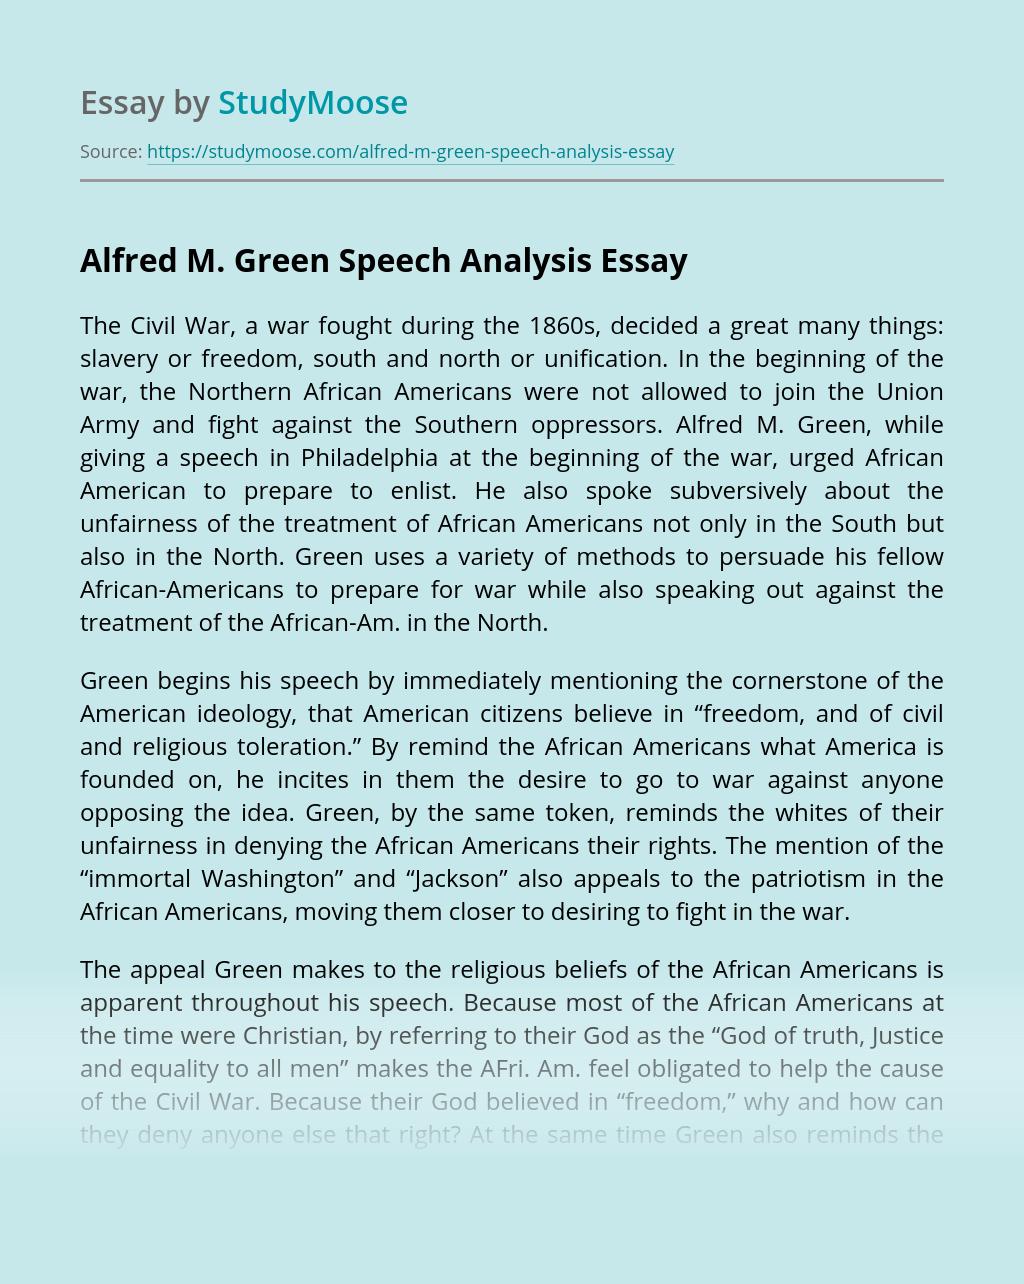 Pay to do popular rhetorical analysis essay on civil war professional rhetorical analysis essay ghostwriter websites au